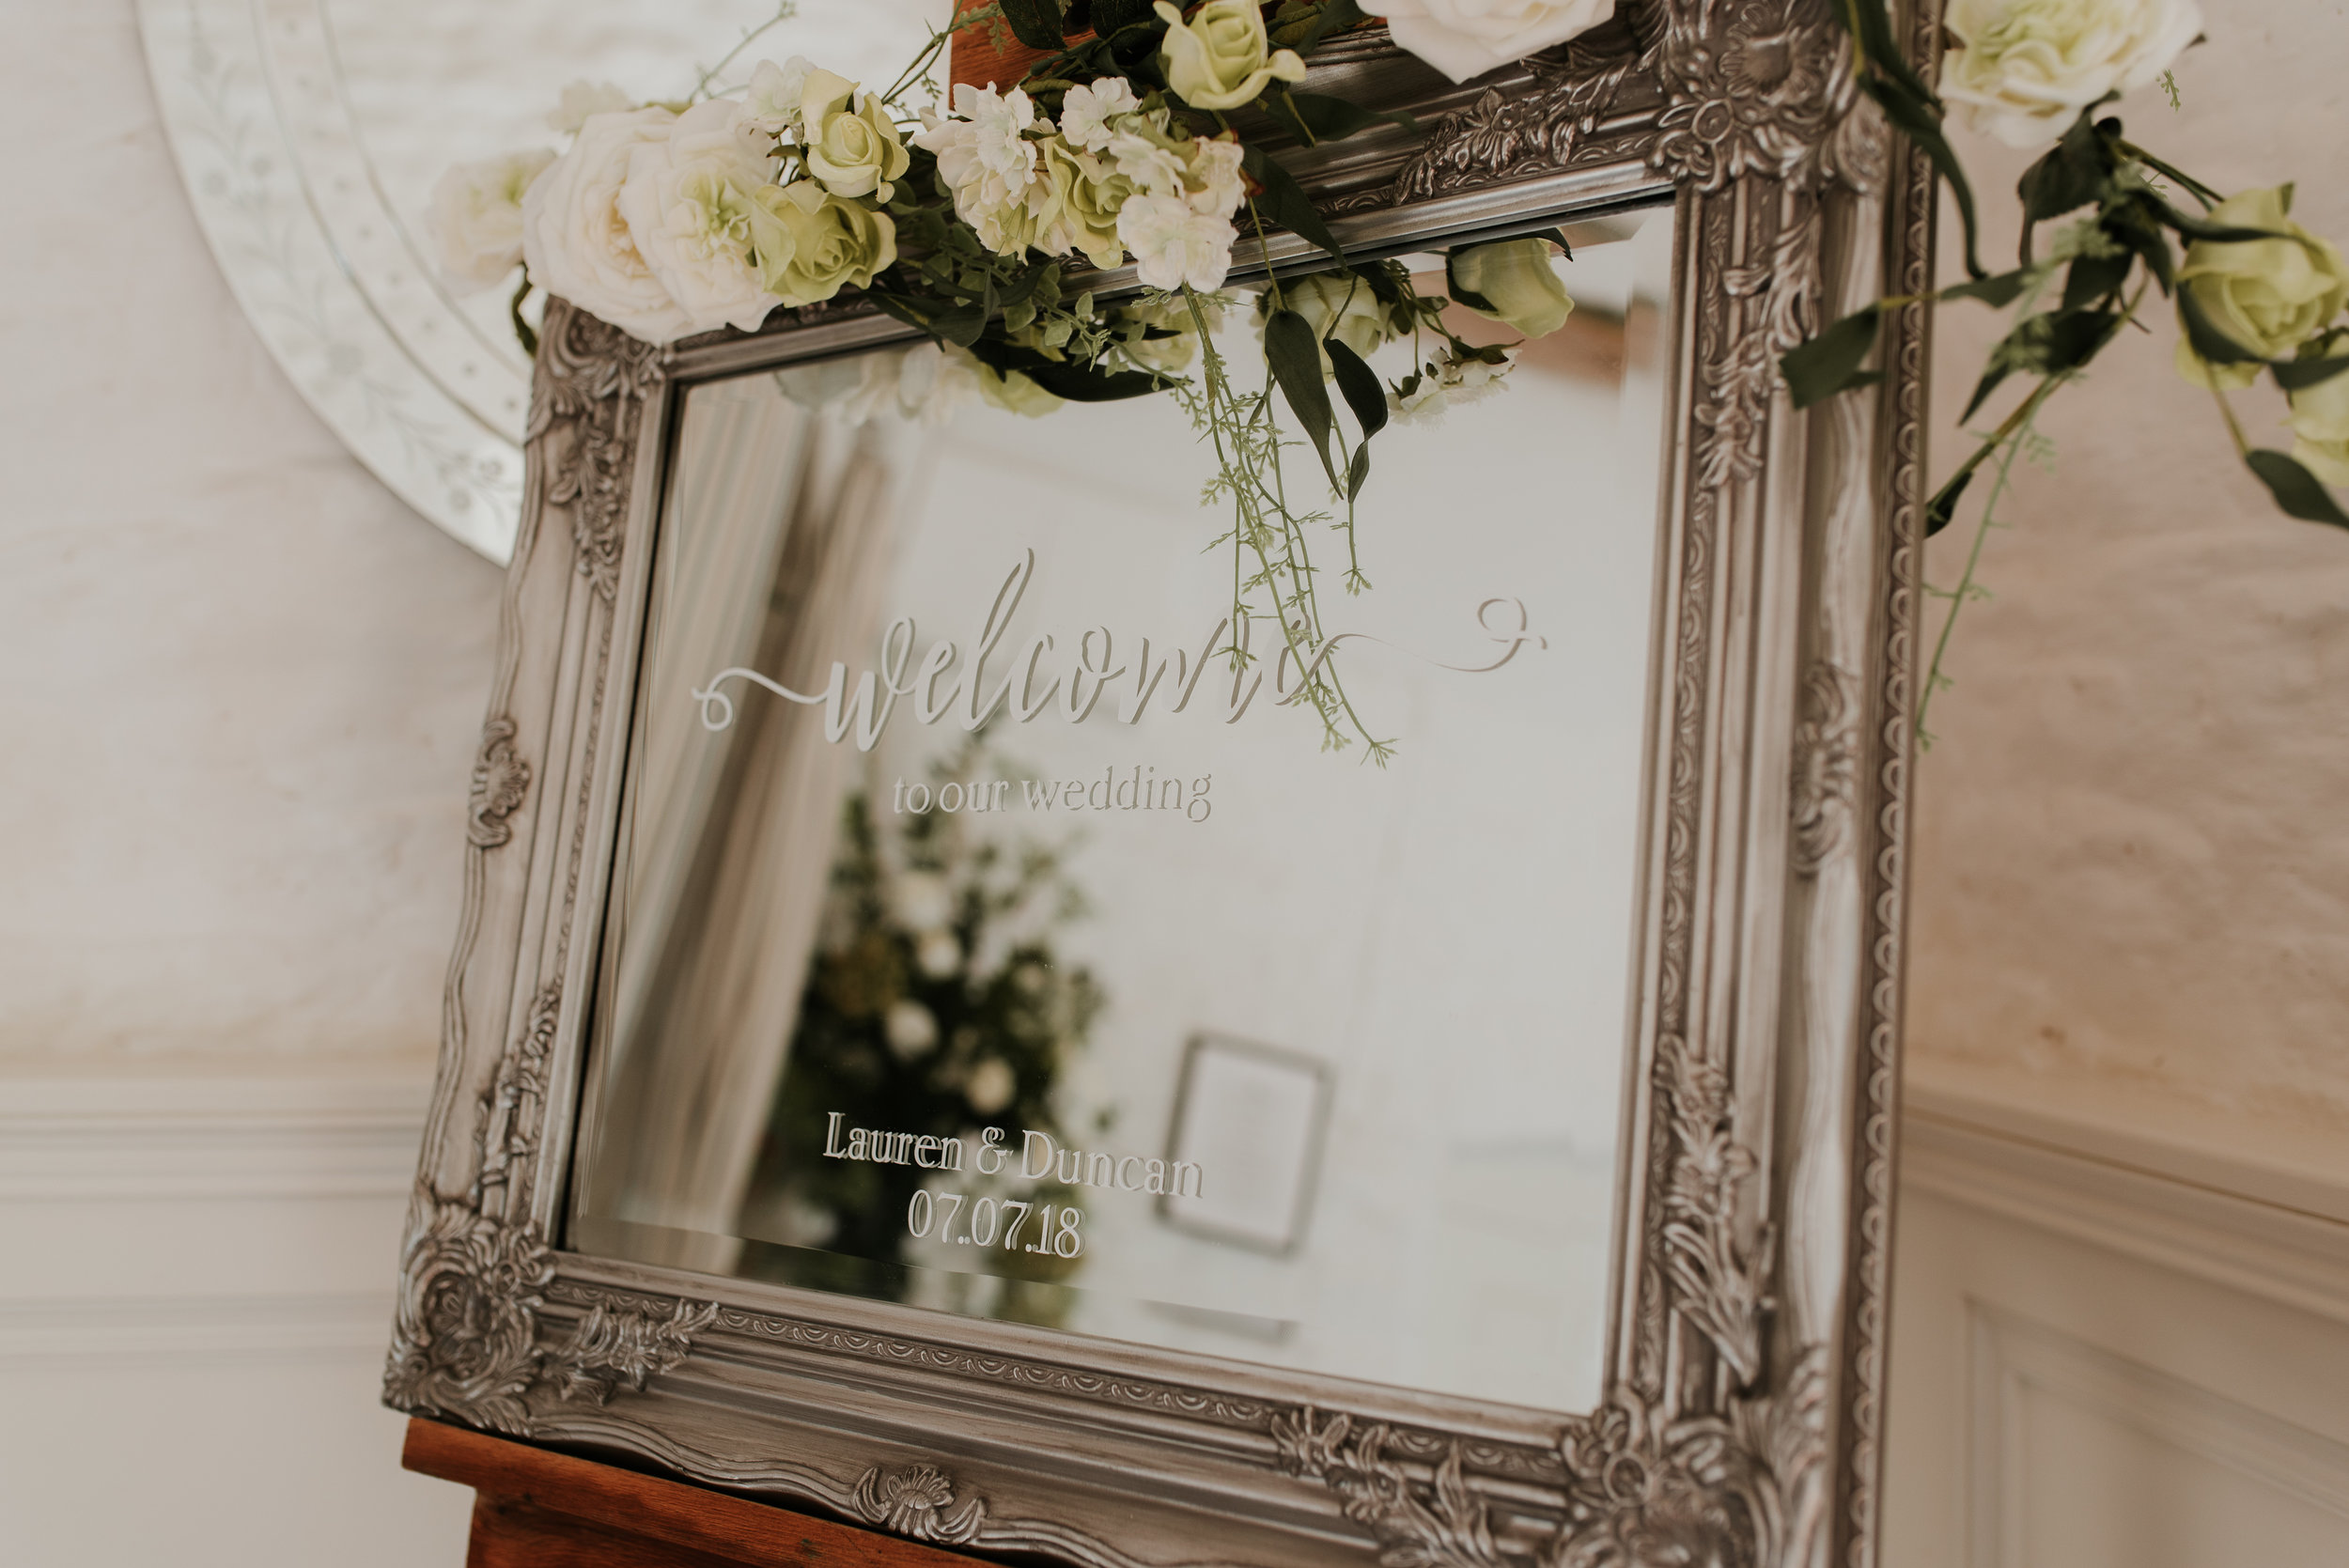 personalised mirror wedding sign